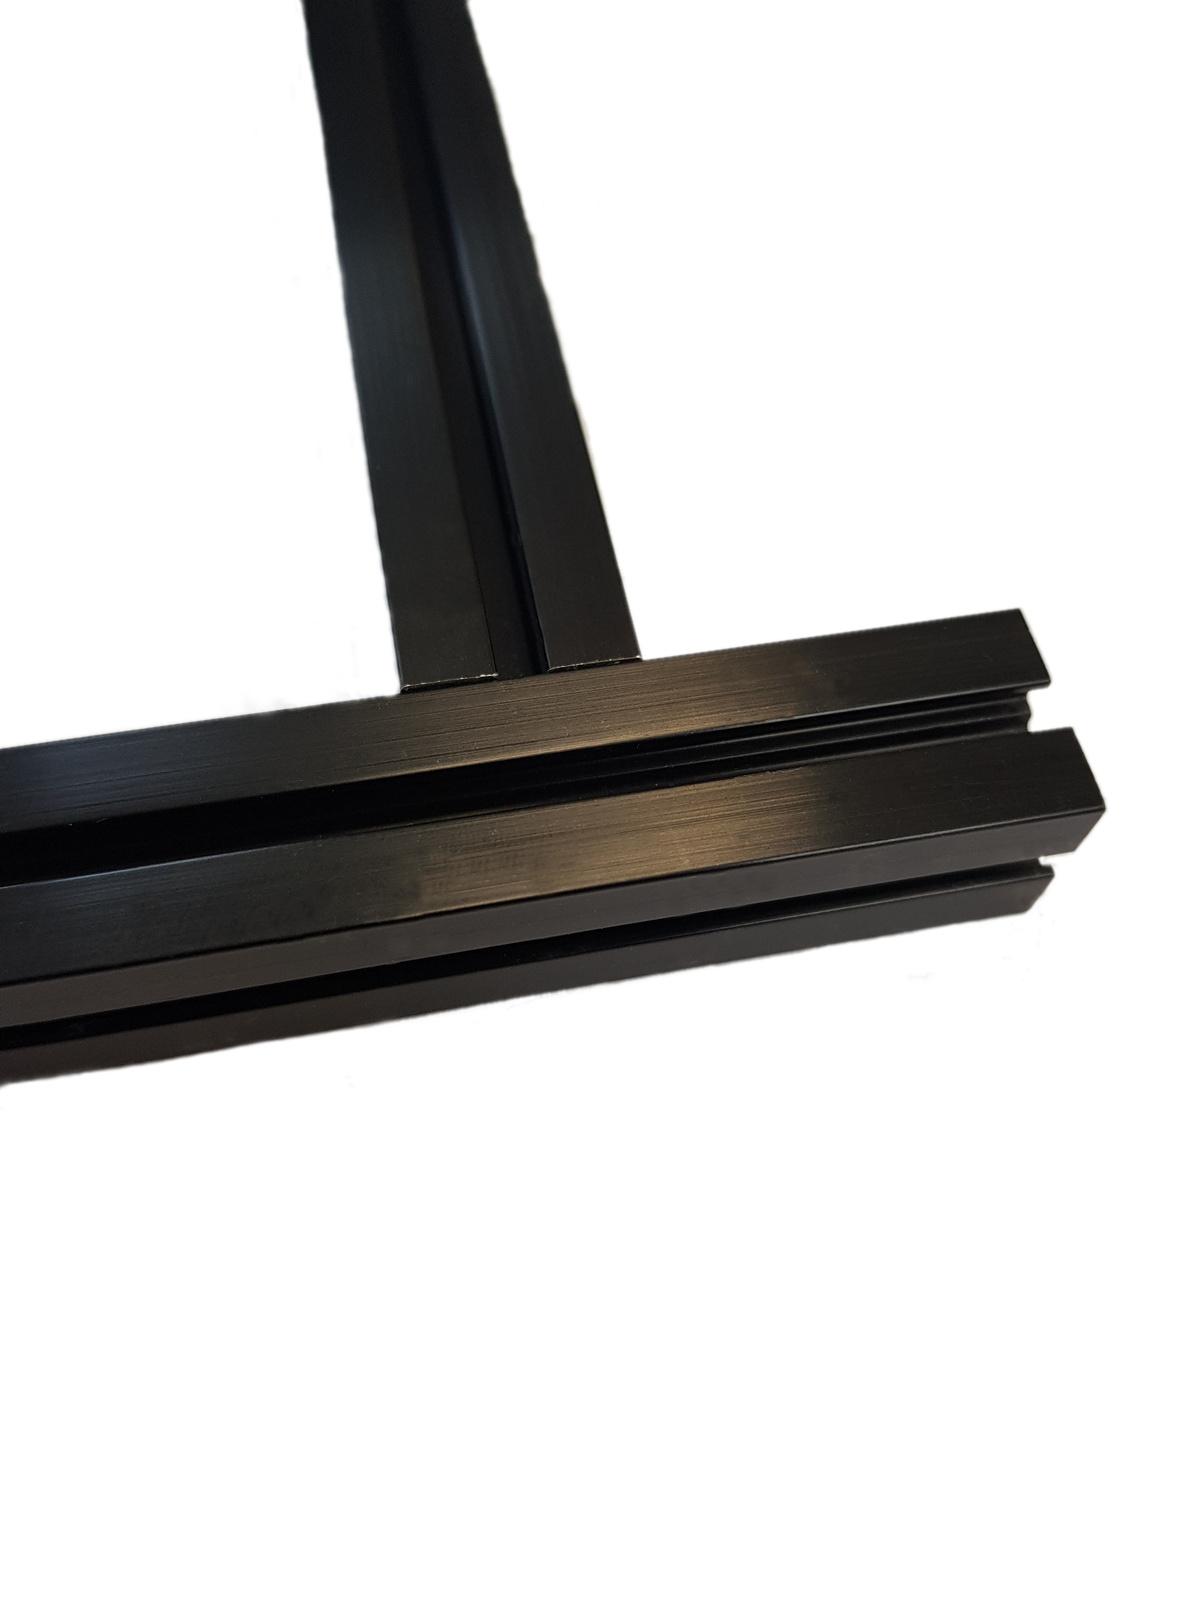 MakerBeam - 10x10mm aluminum profile 90 degree blind fastener